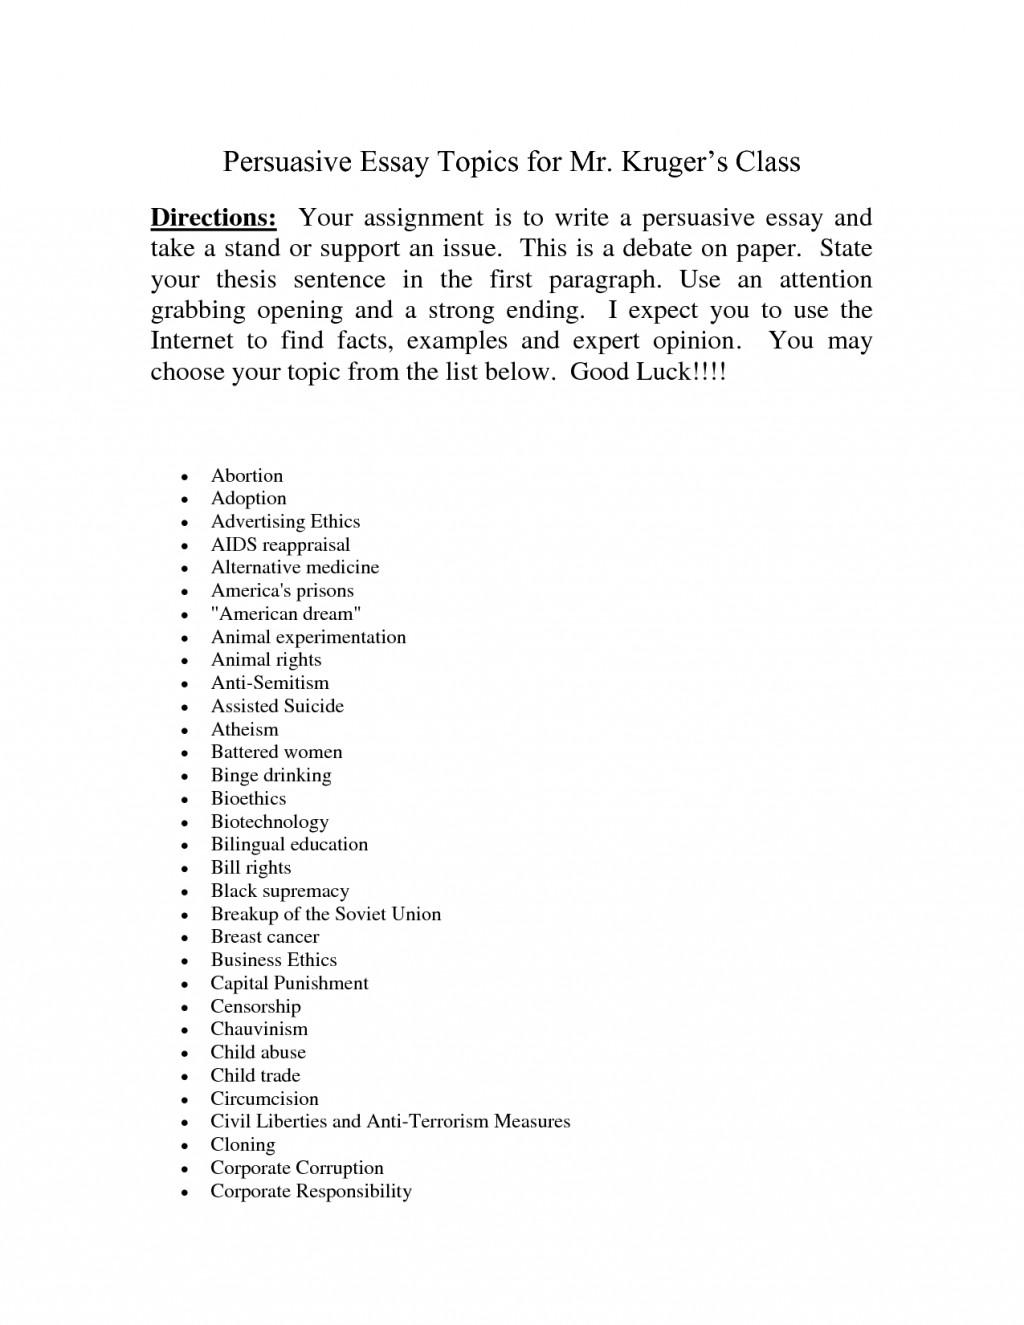 010 Good Persuasive Essay Topics K2g37wzqlu Amazing For College Argumentative High School Large